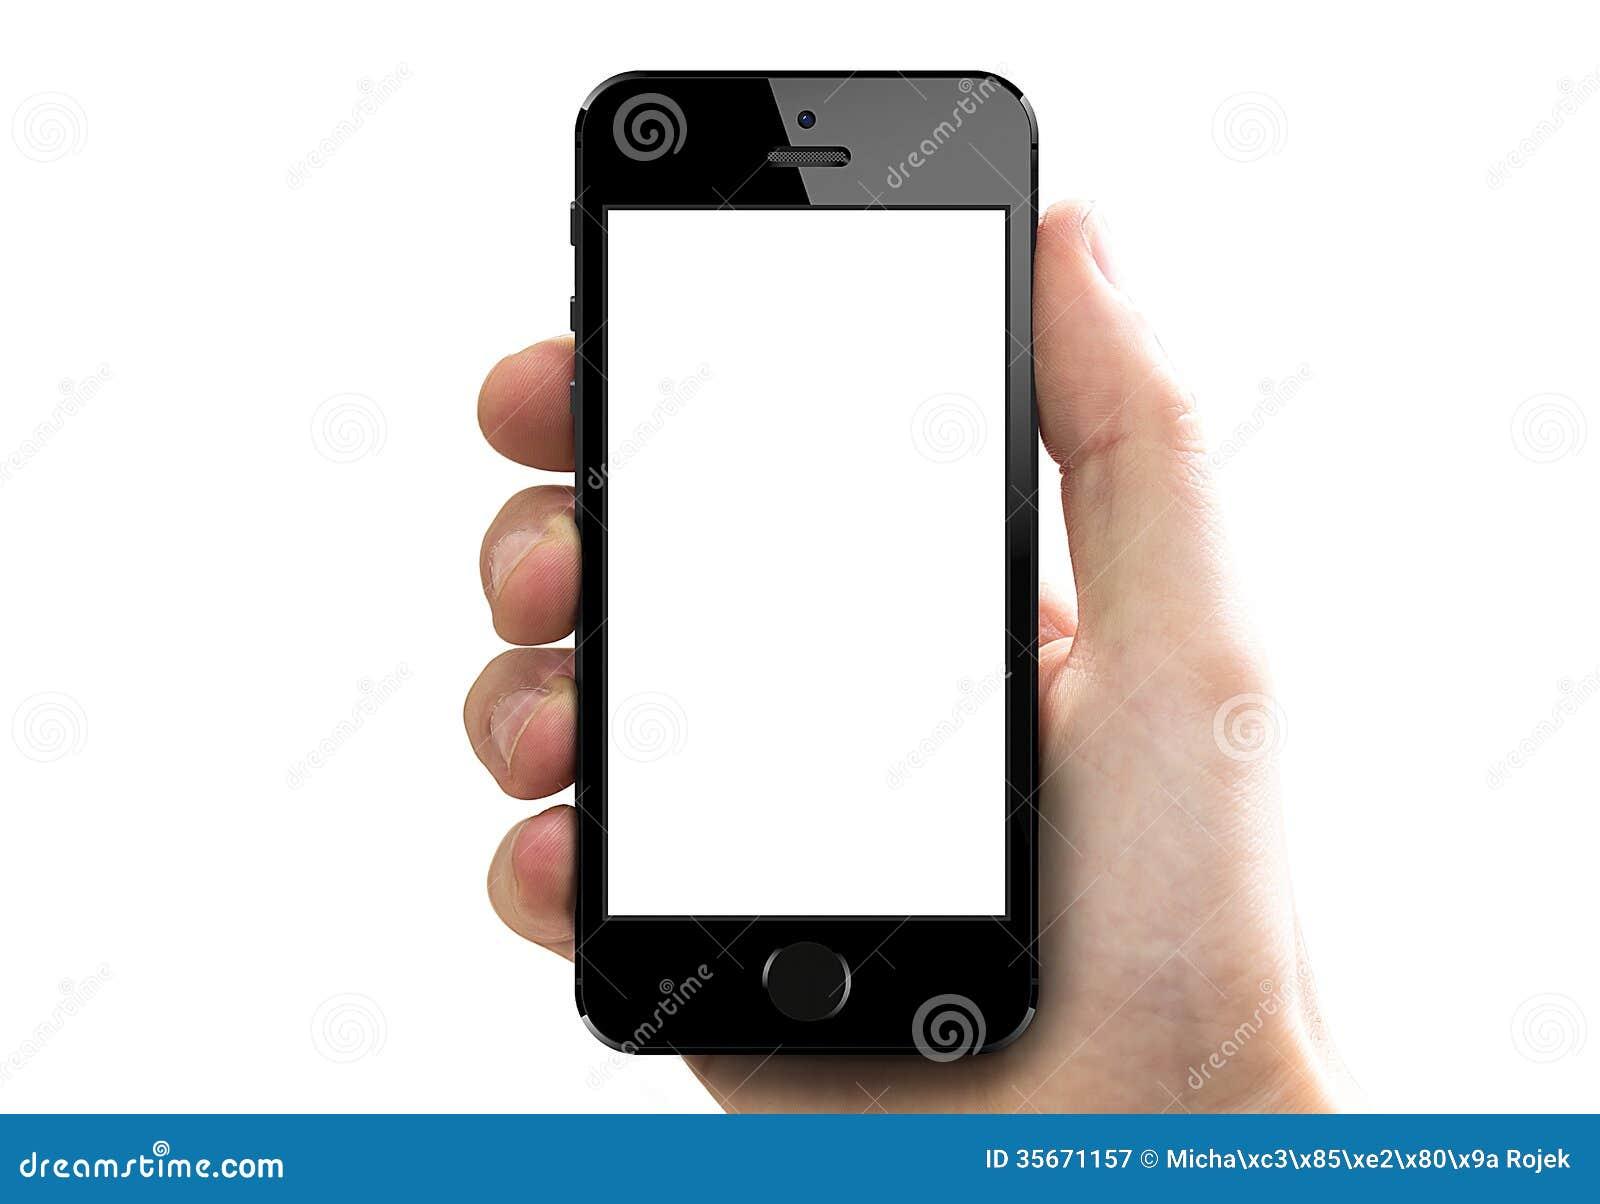 Iphone 5s i hand